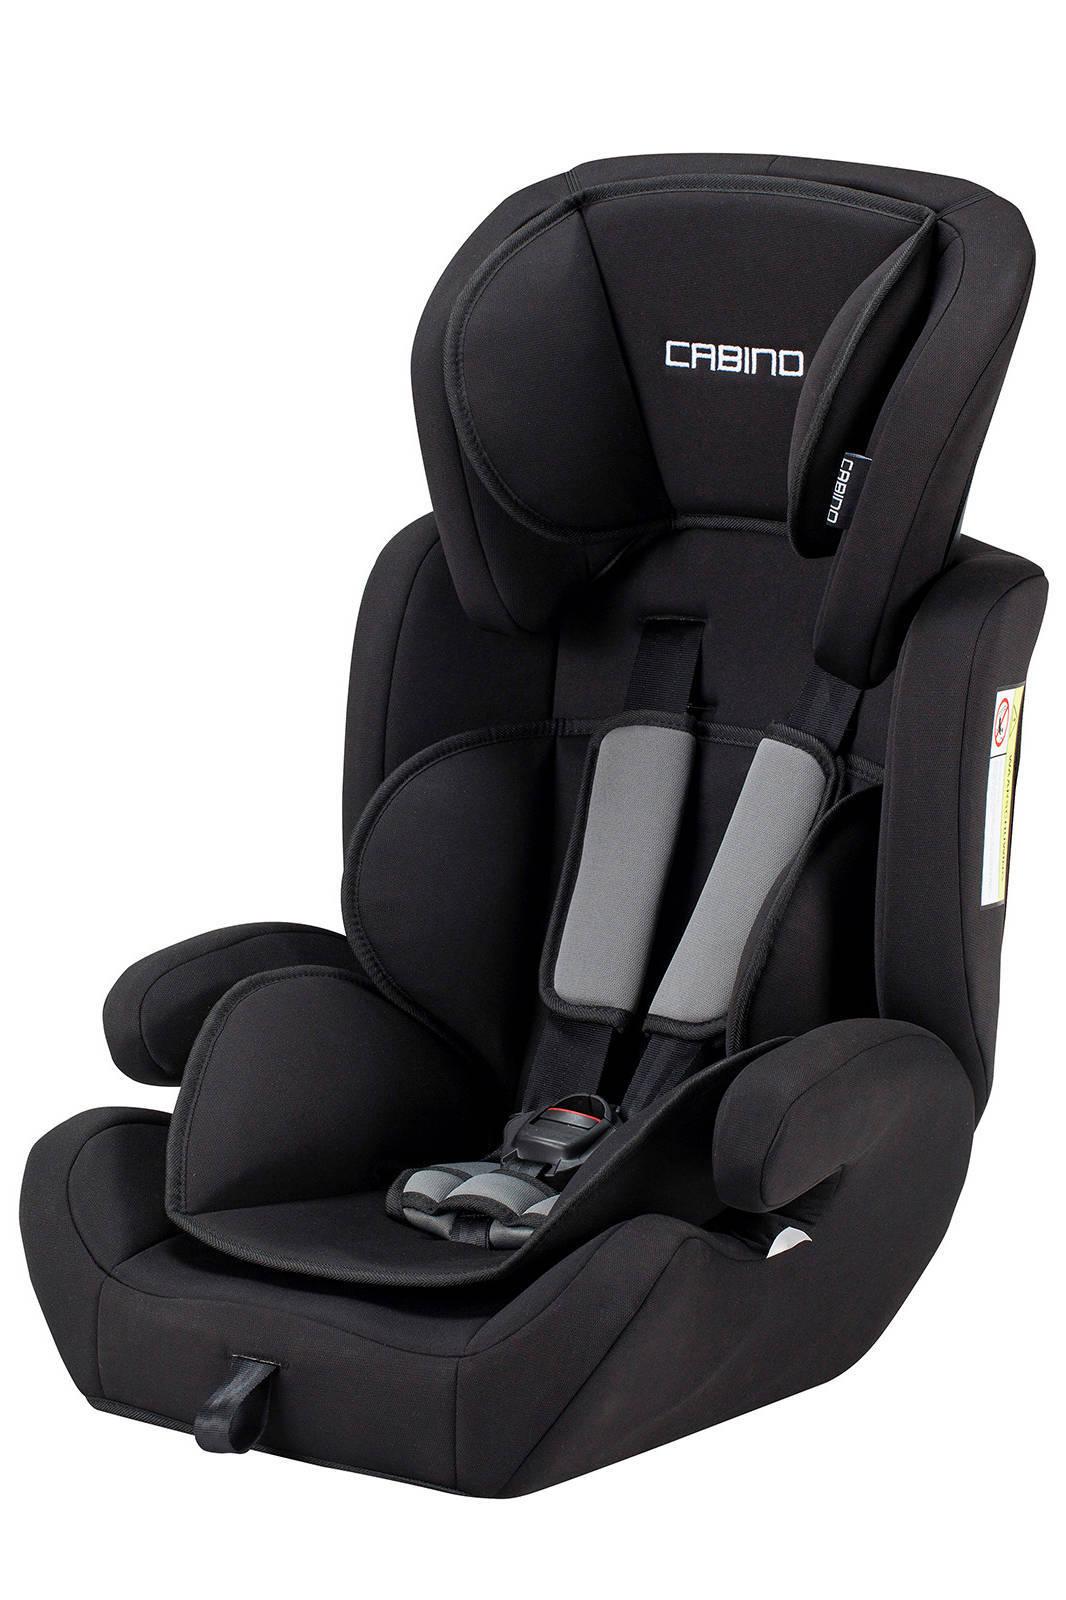 Verbazingwekkend Cabino autostoel 9-36 kg zwart/grijs | wehkamp WJ-32